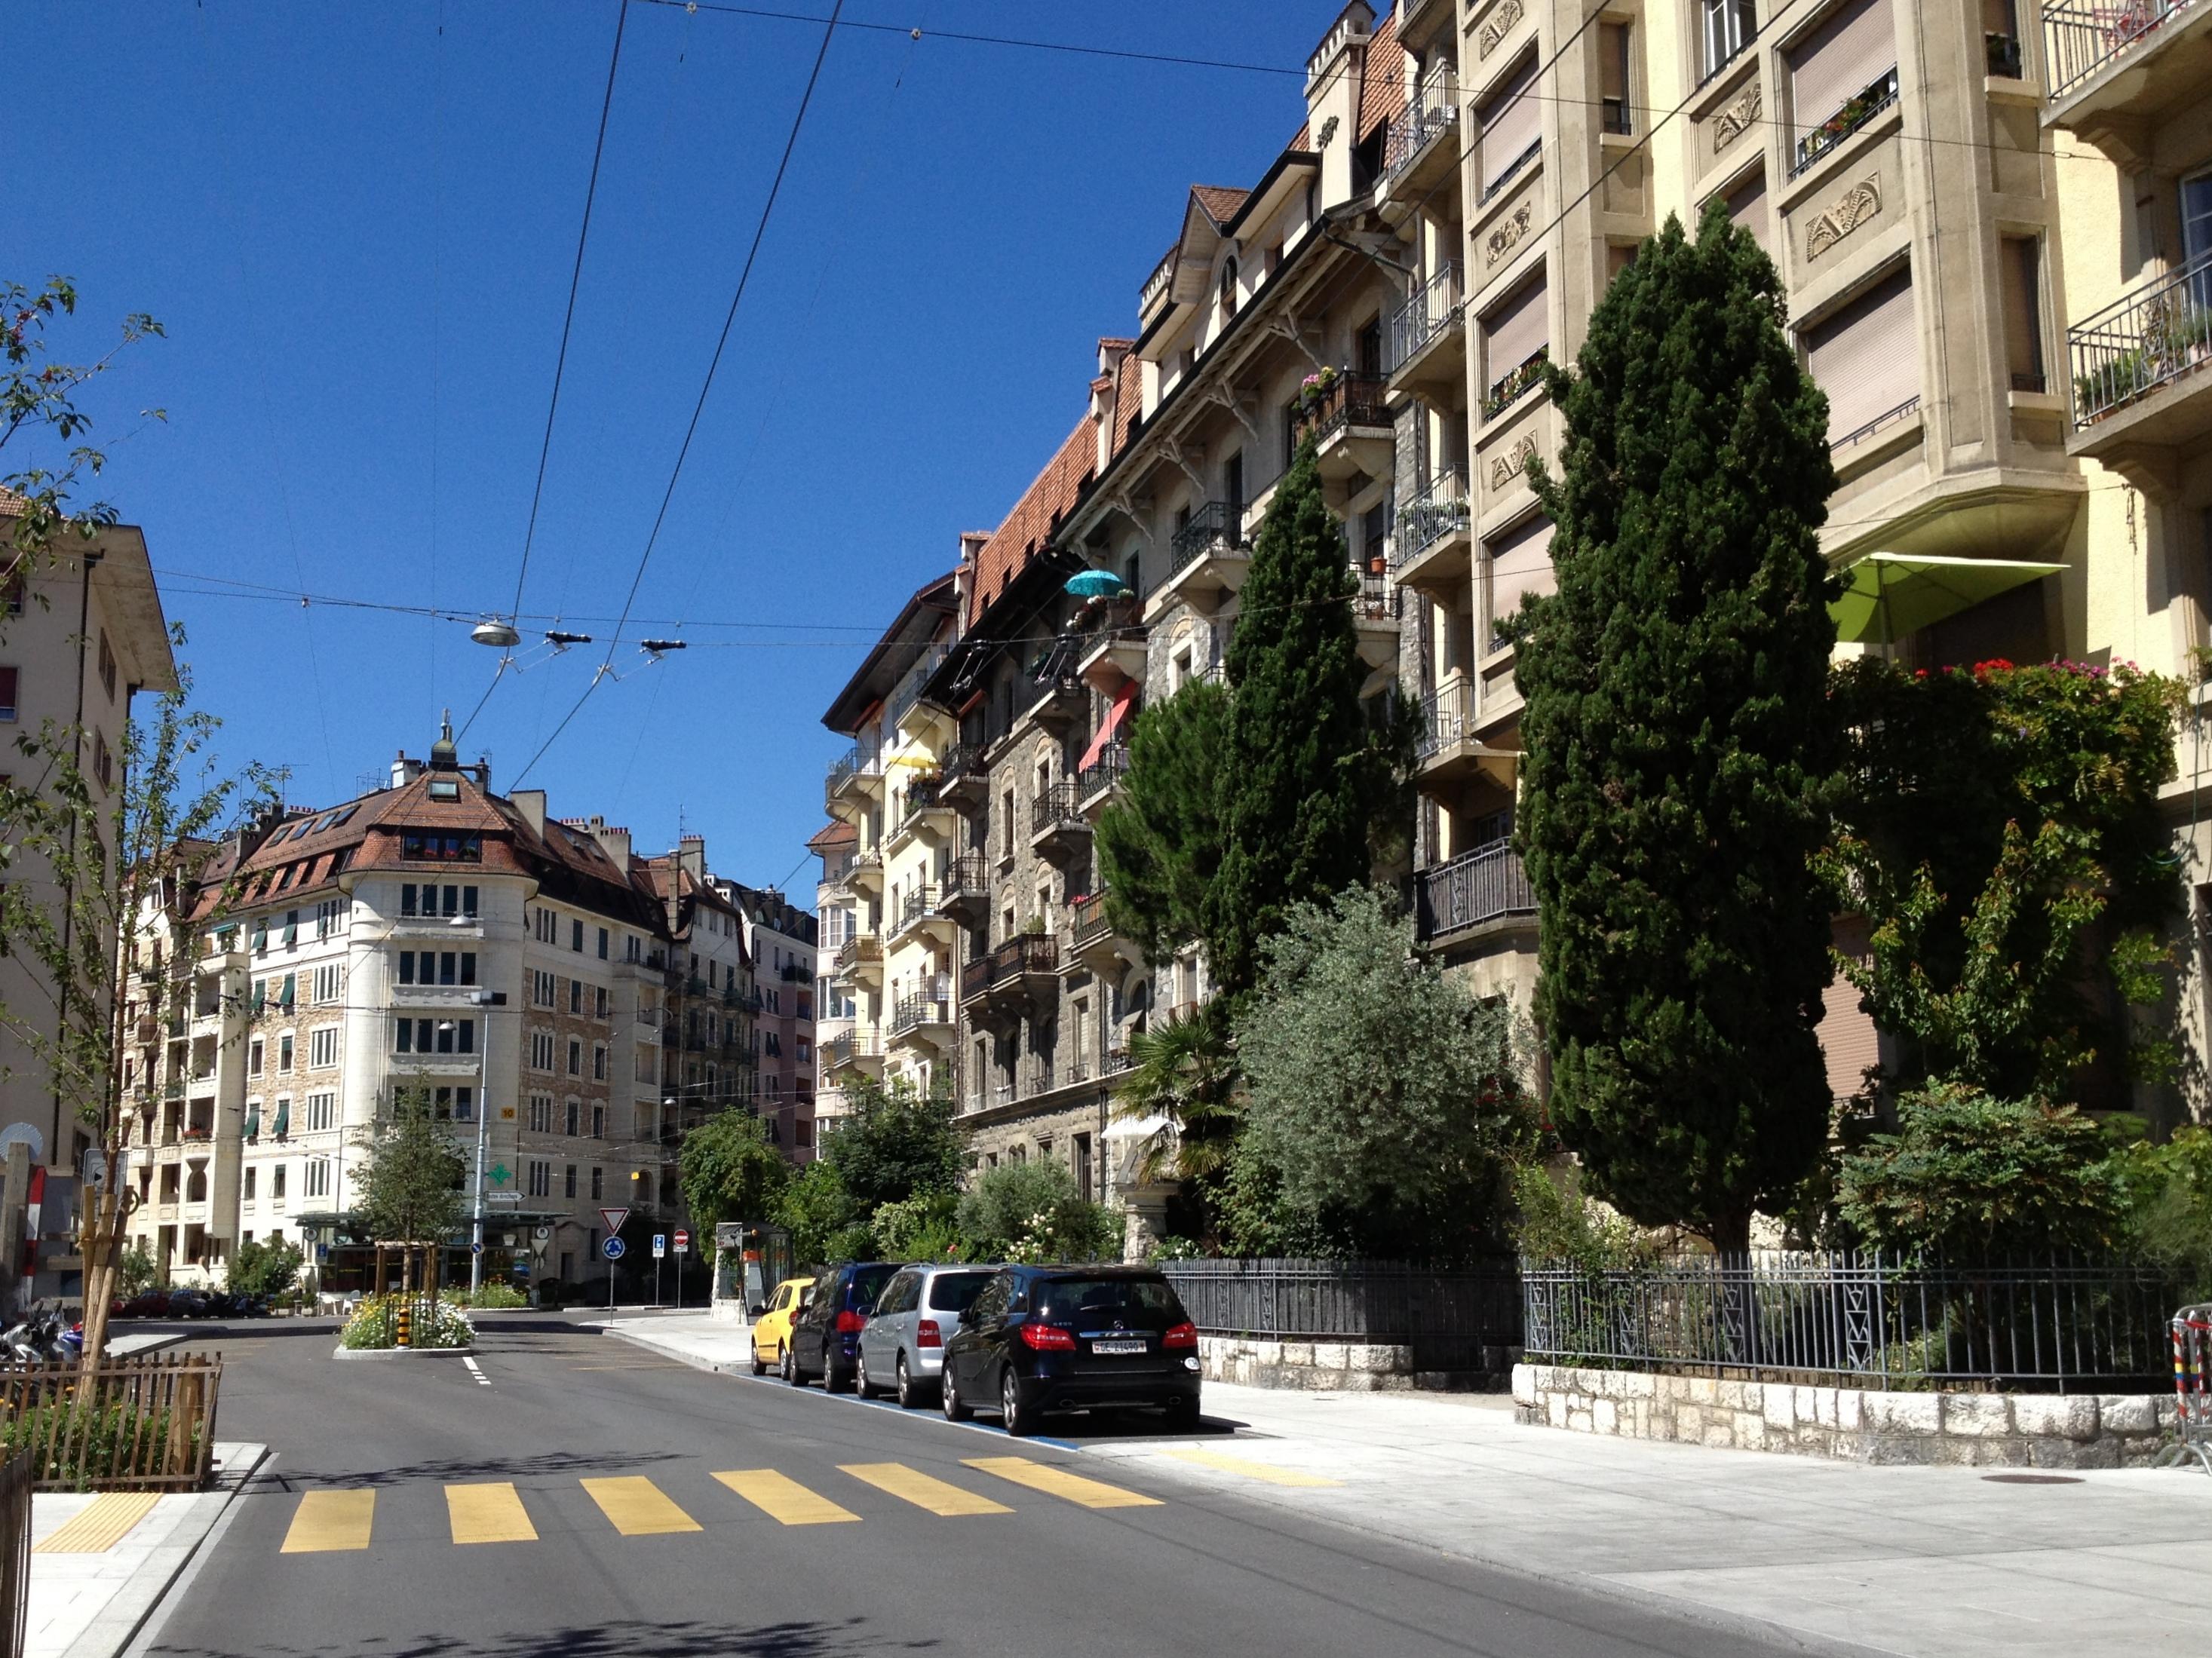 A sunny picture of Saint-Jean, a neighborhood very close to the EU Business School Geneva campus.